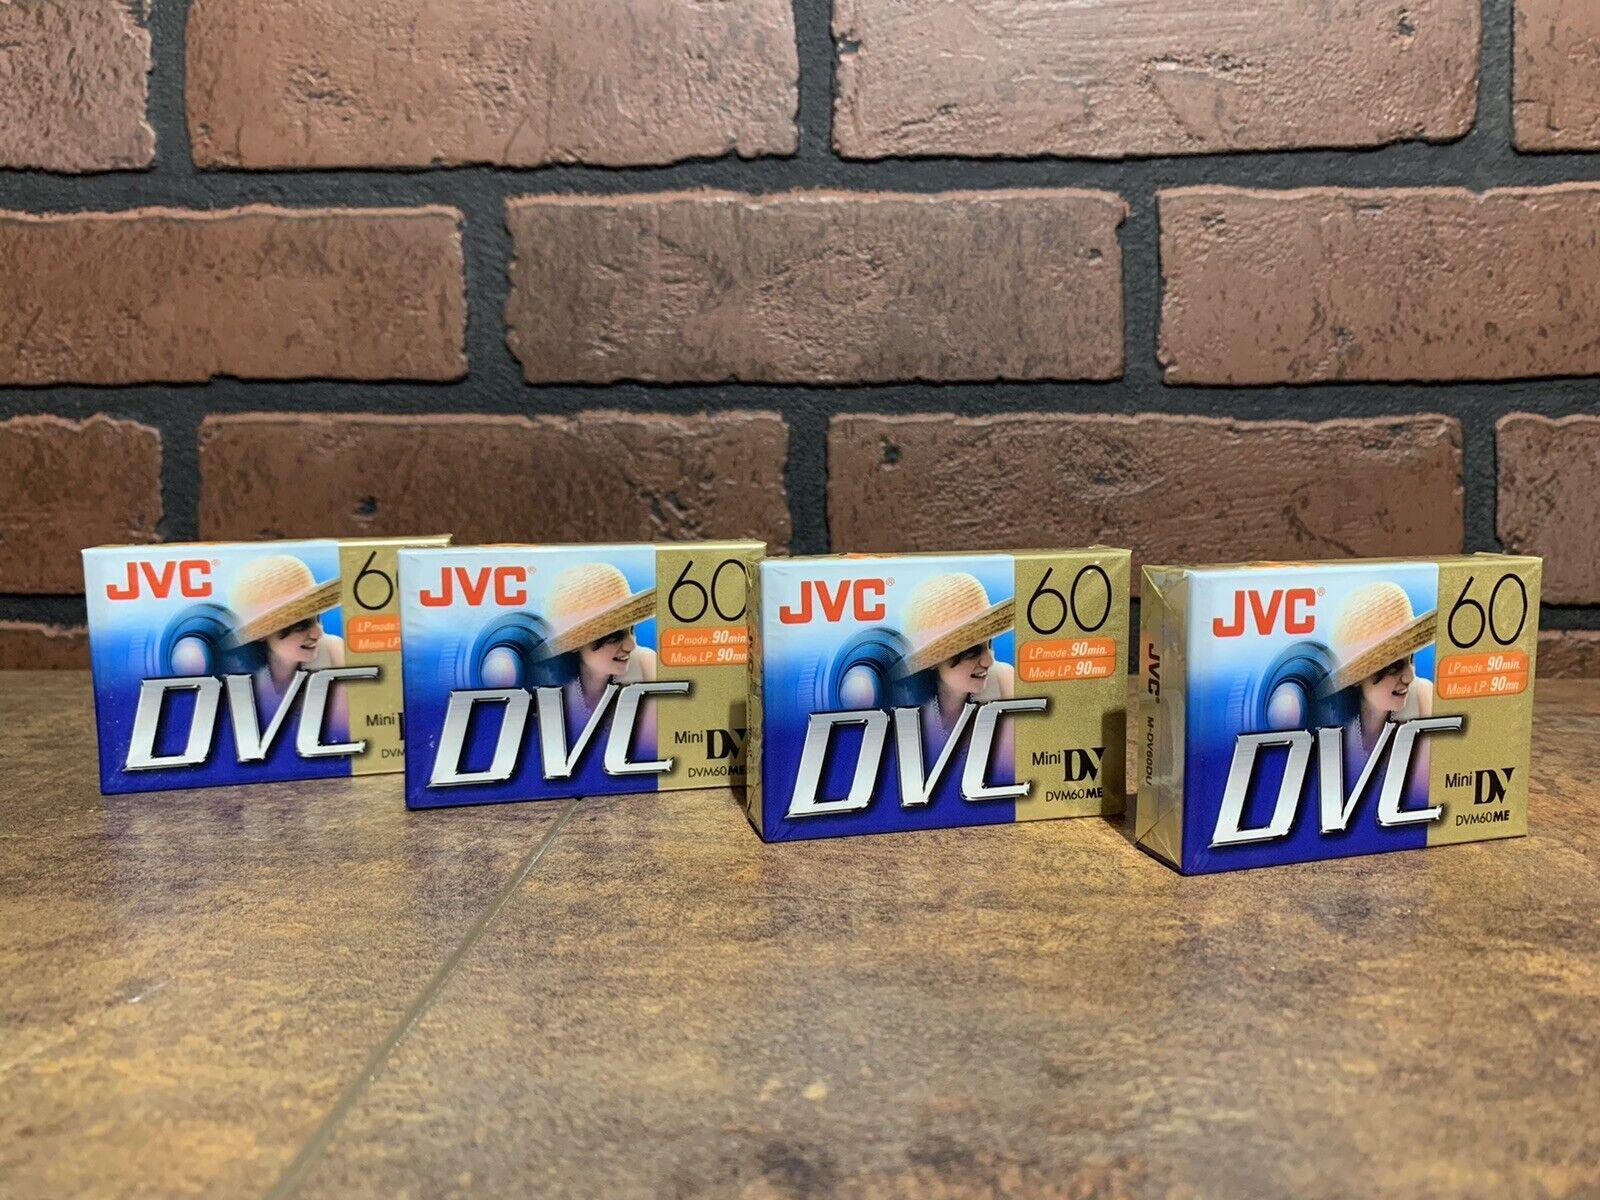 Lot of 4 JVC Mini DV DVC Digital Video Cassette Tapes DVM60ME / M-DV60DU [NEW]